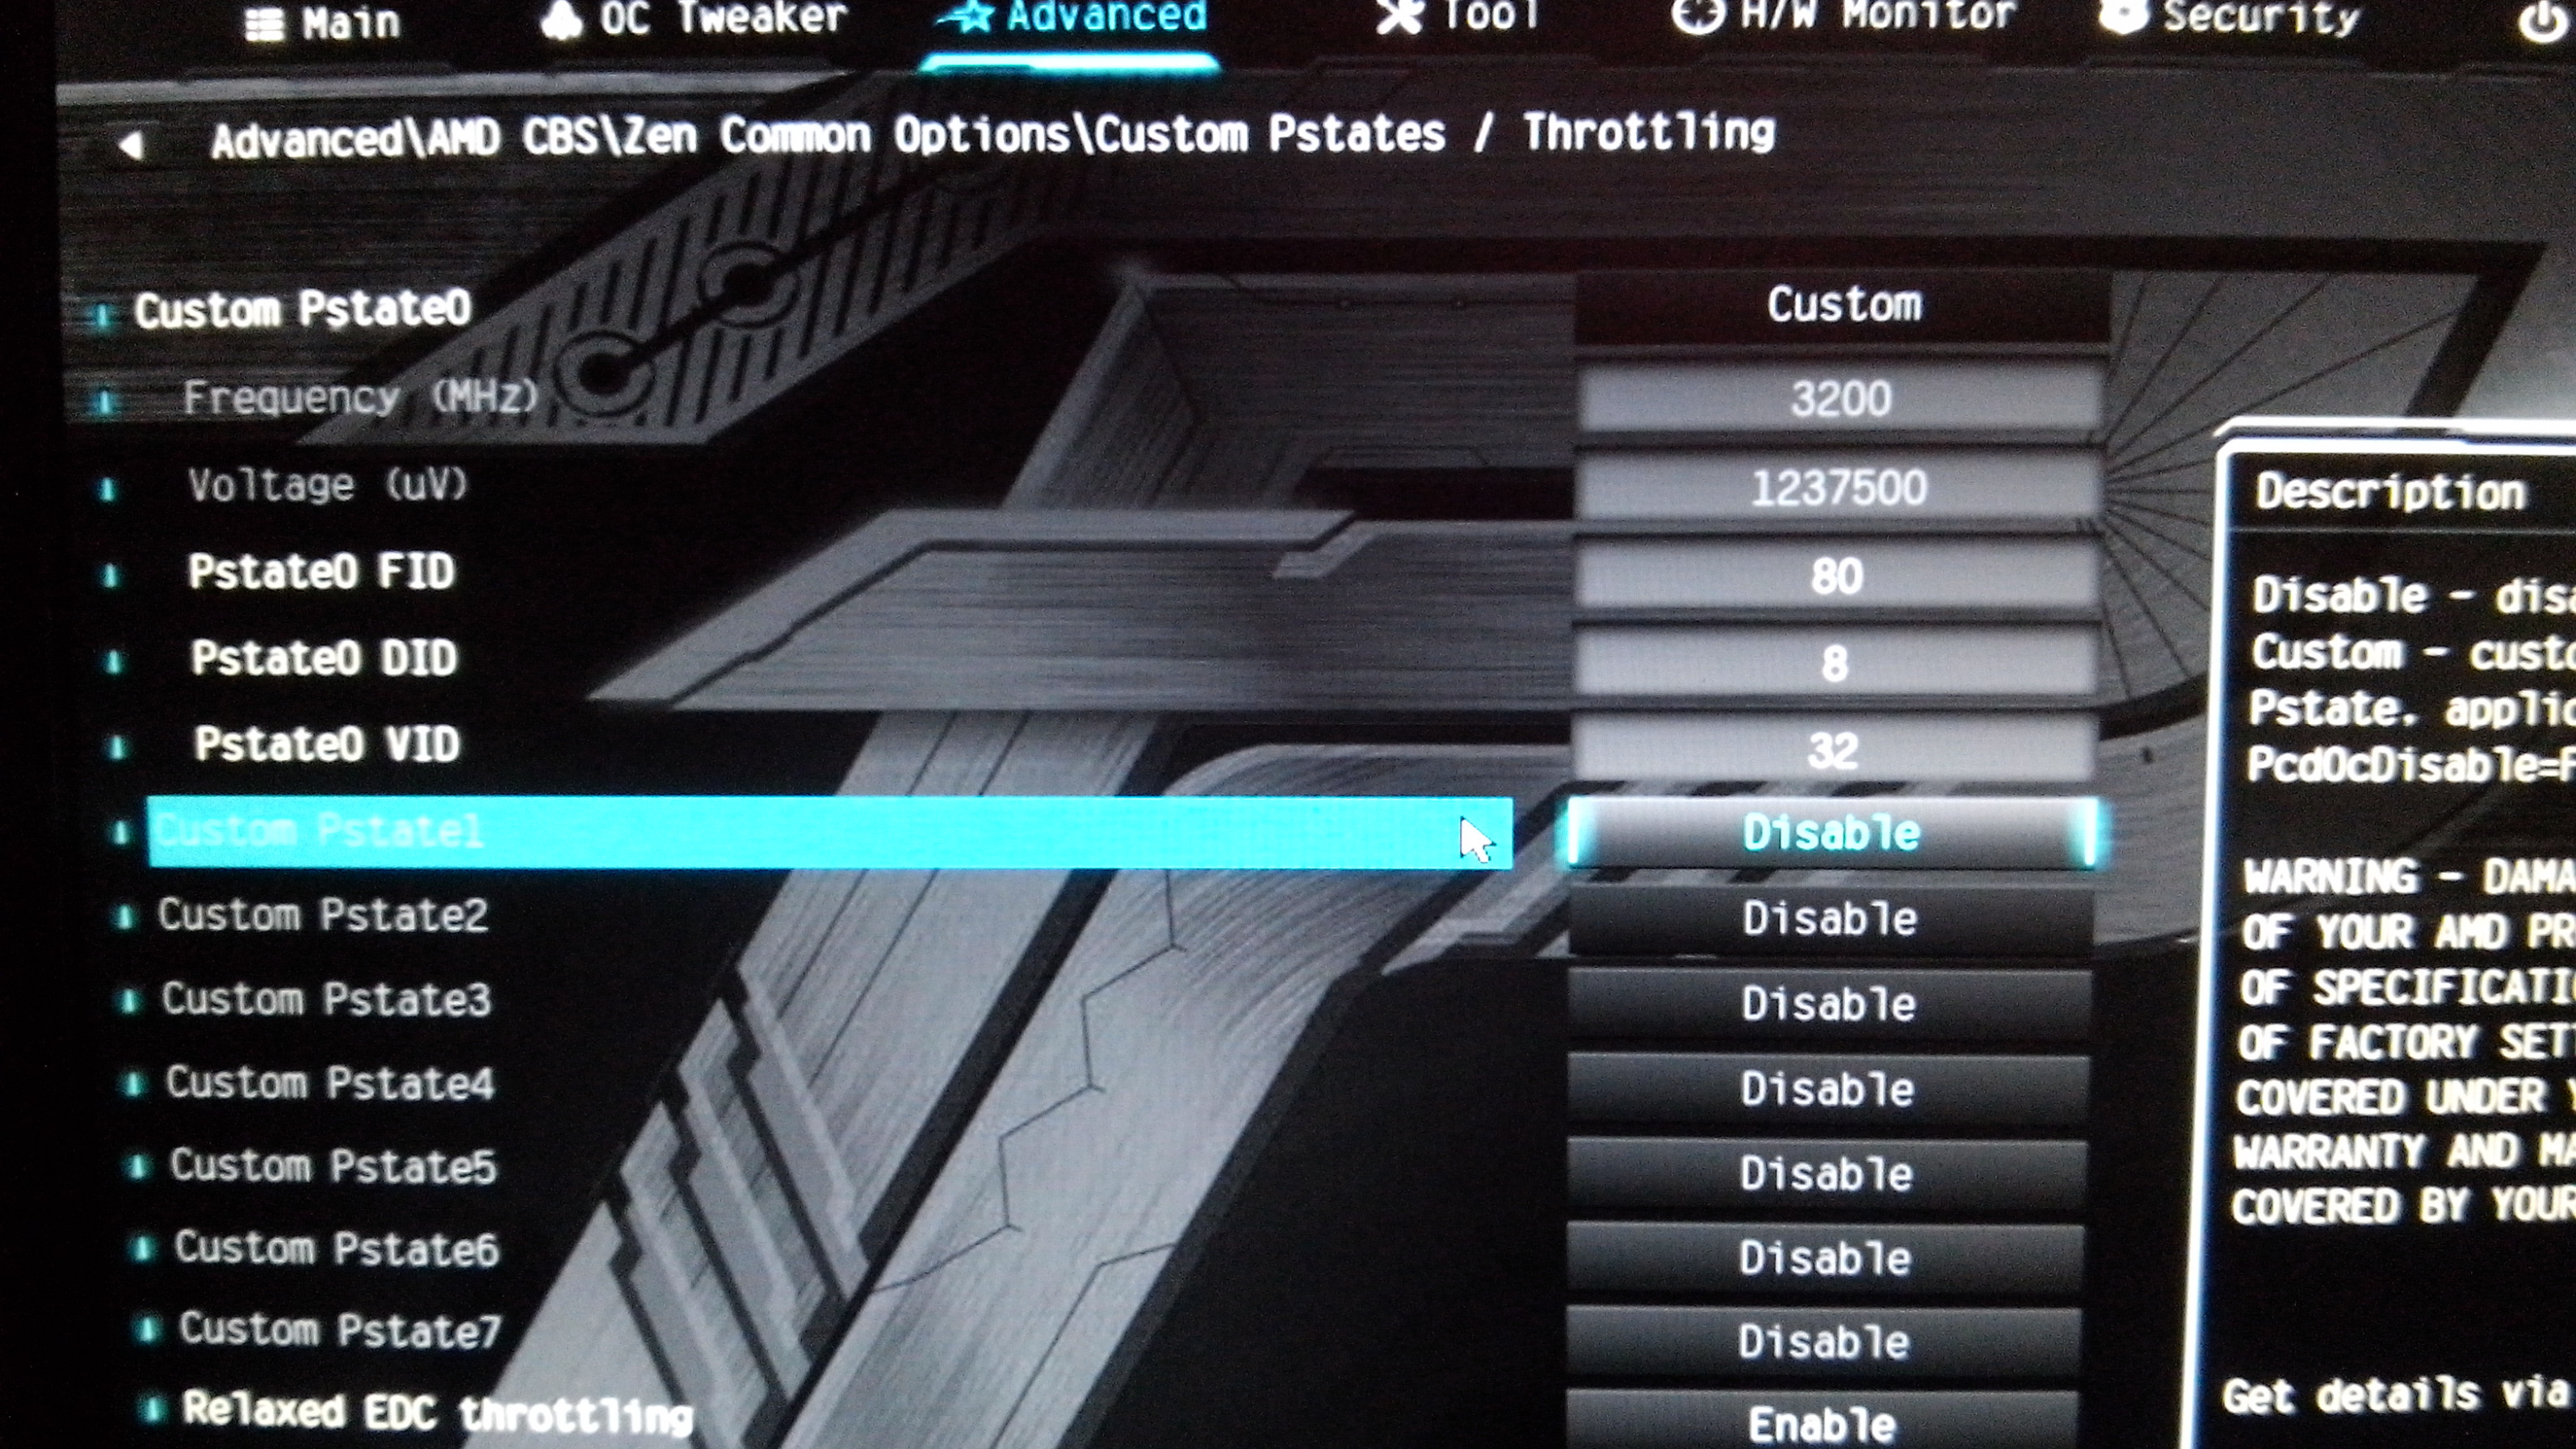 AMD Ryzen 5 1600 freezed / ASRock AB350M Pro 4